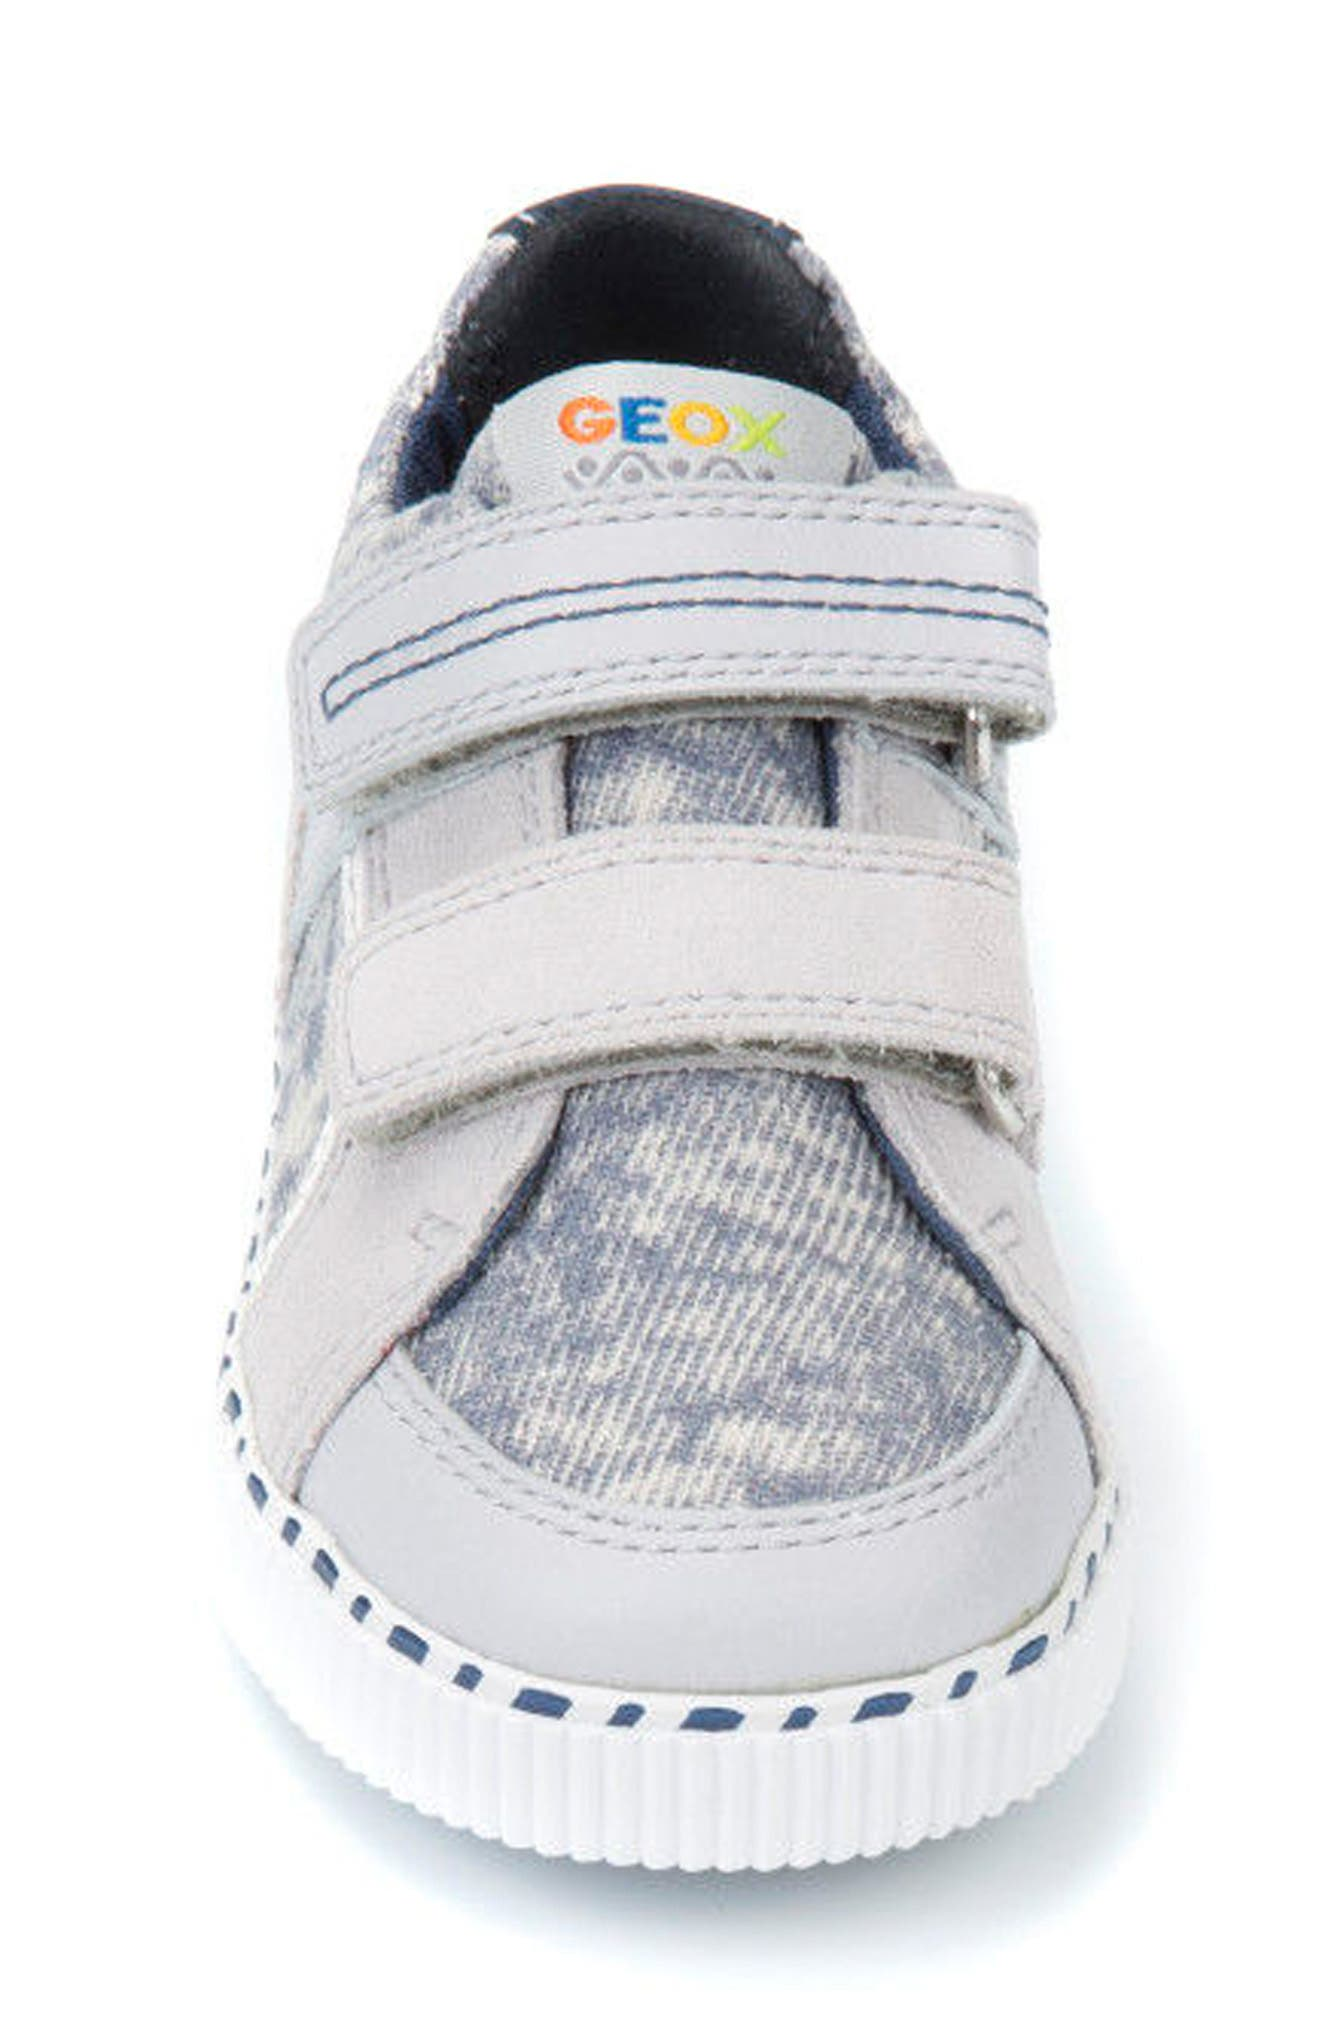 Kilwi Knit Sneaker,                             Alternate thumbnail 4, color,                             LIGHT GREY/ WHITE